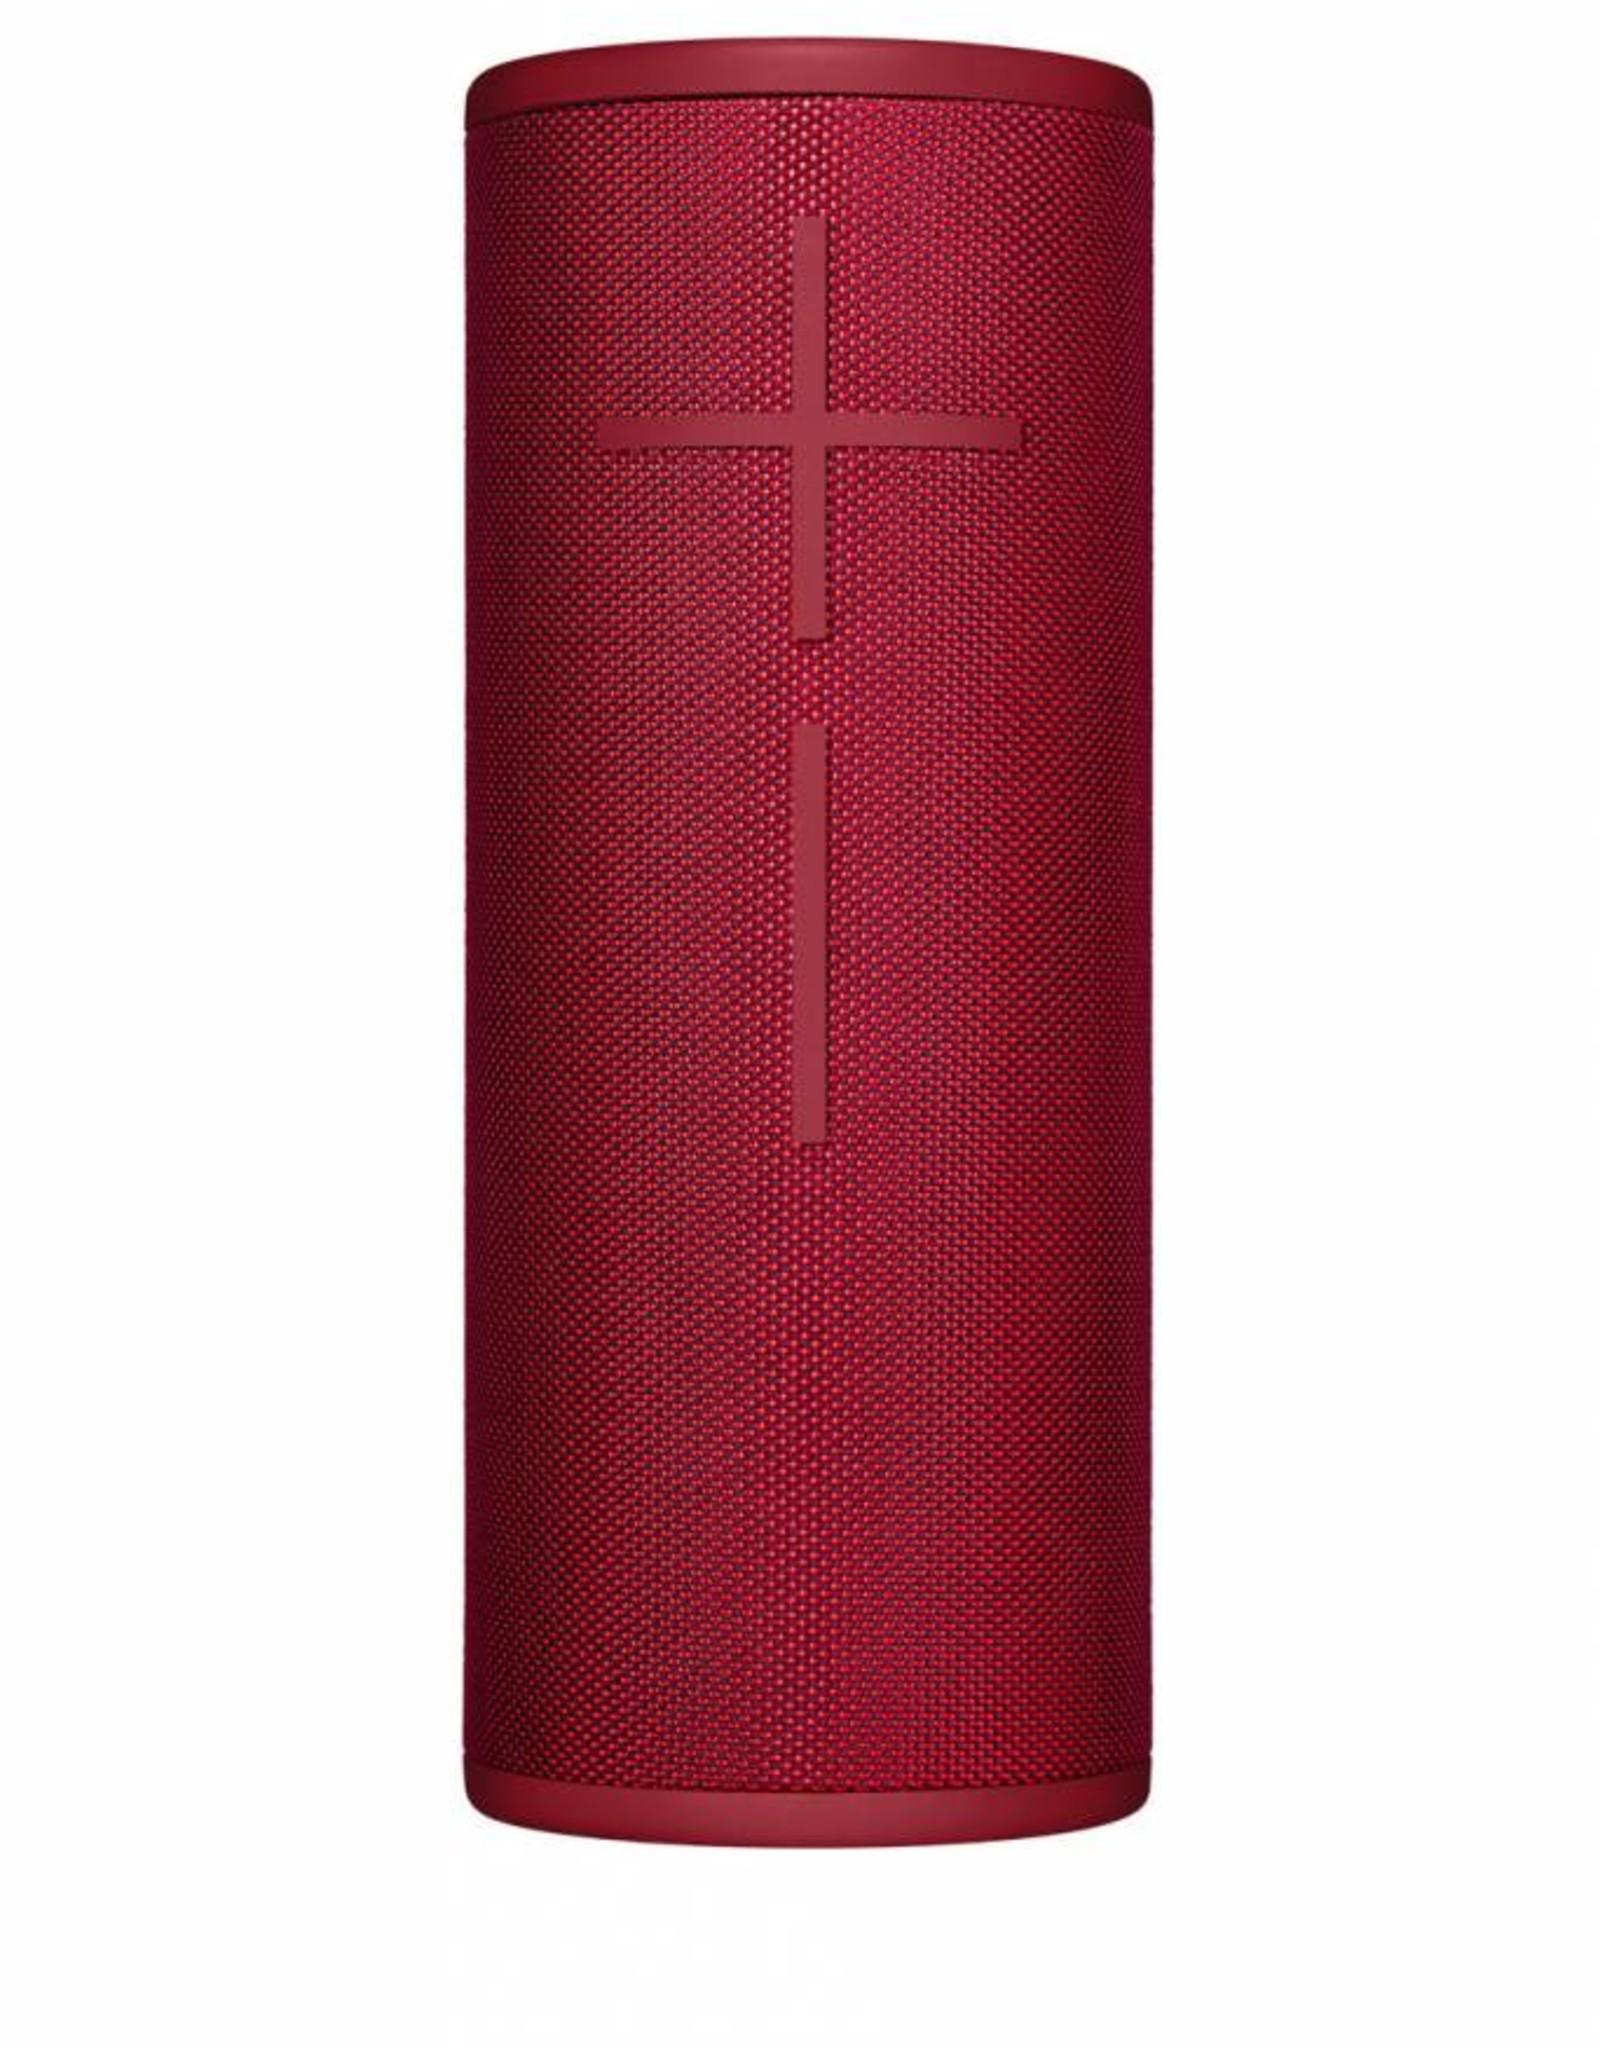 Ultimate Ears | Boom 3 Wireless Bluetooth Speaker-Sunset Red | 984001352